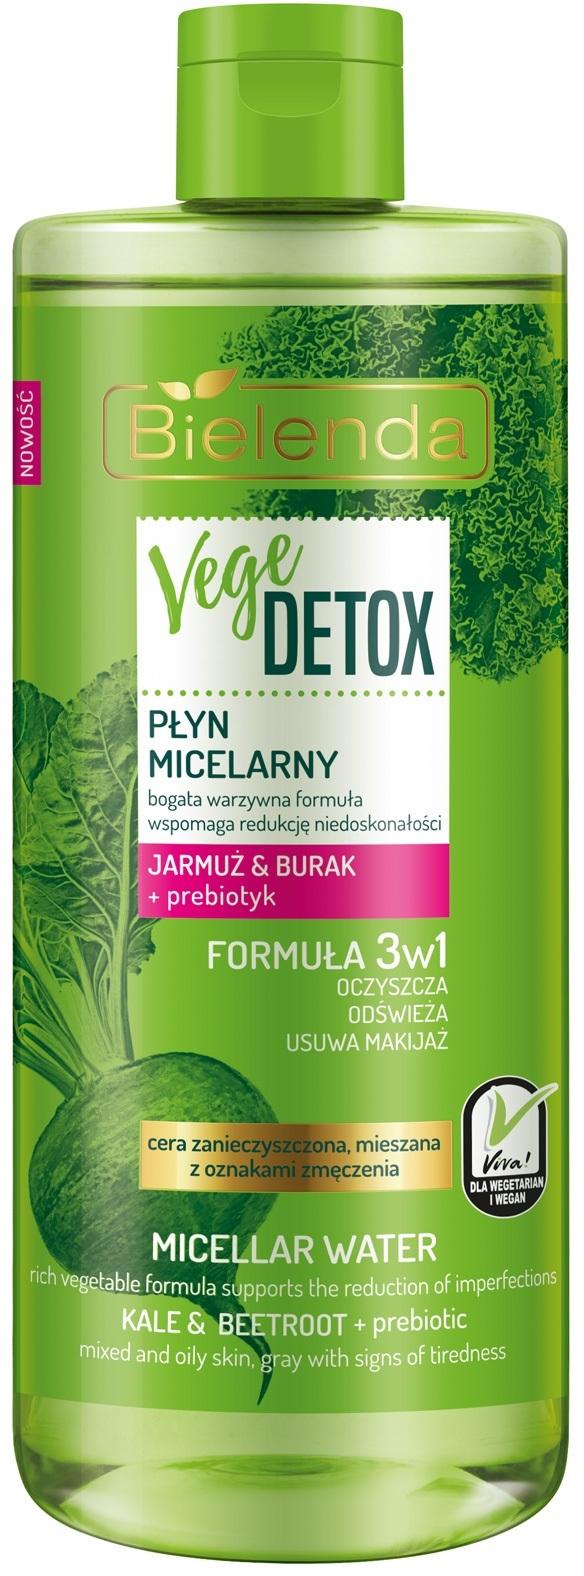 VEGE DETOX Нормализующая мицелярная вода, смешанная кожа, капуста кале+свекла+пребиотик, 500 мл